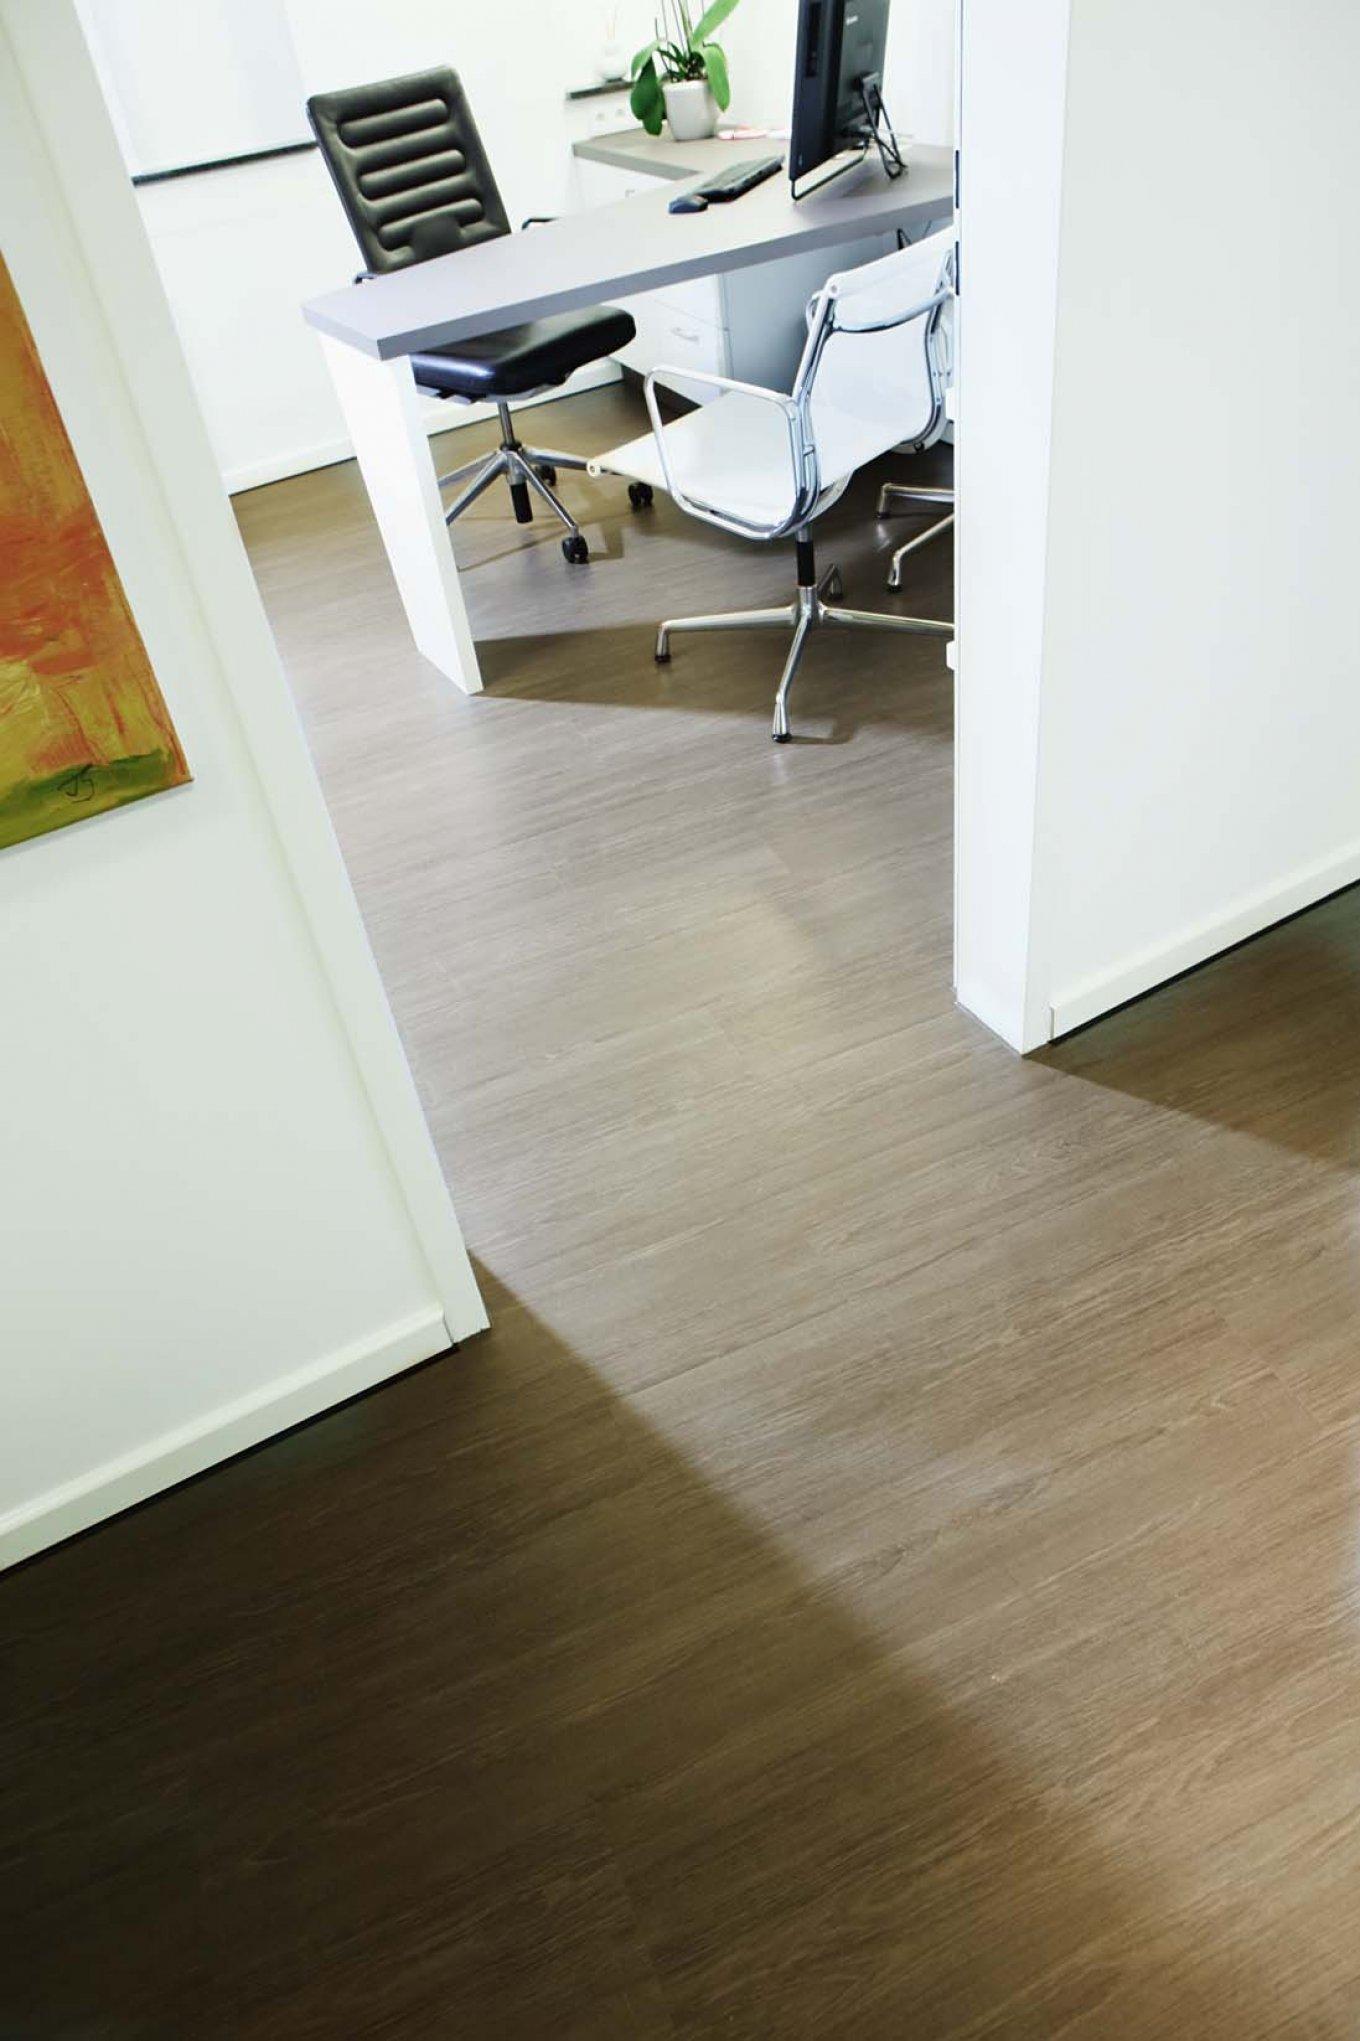 wineo Bodenbelag in Arztpraxis Bürostuhl Holzoptik moderne Einrichtung Praxisraum Behandlungsraum Vinylboden